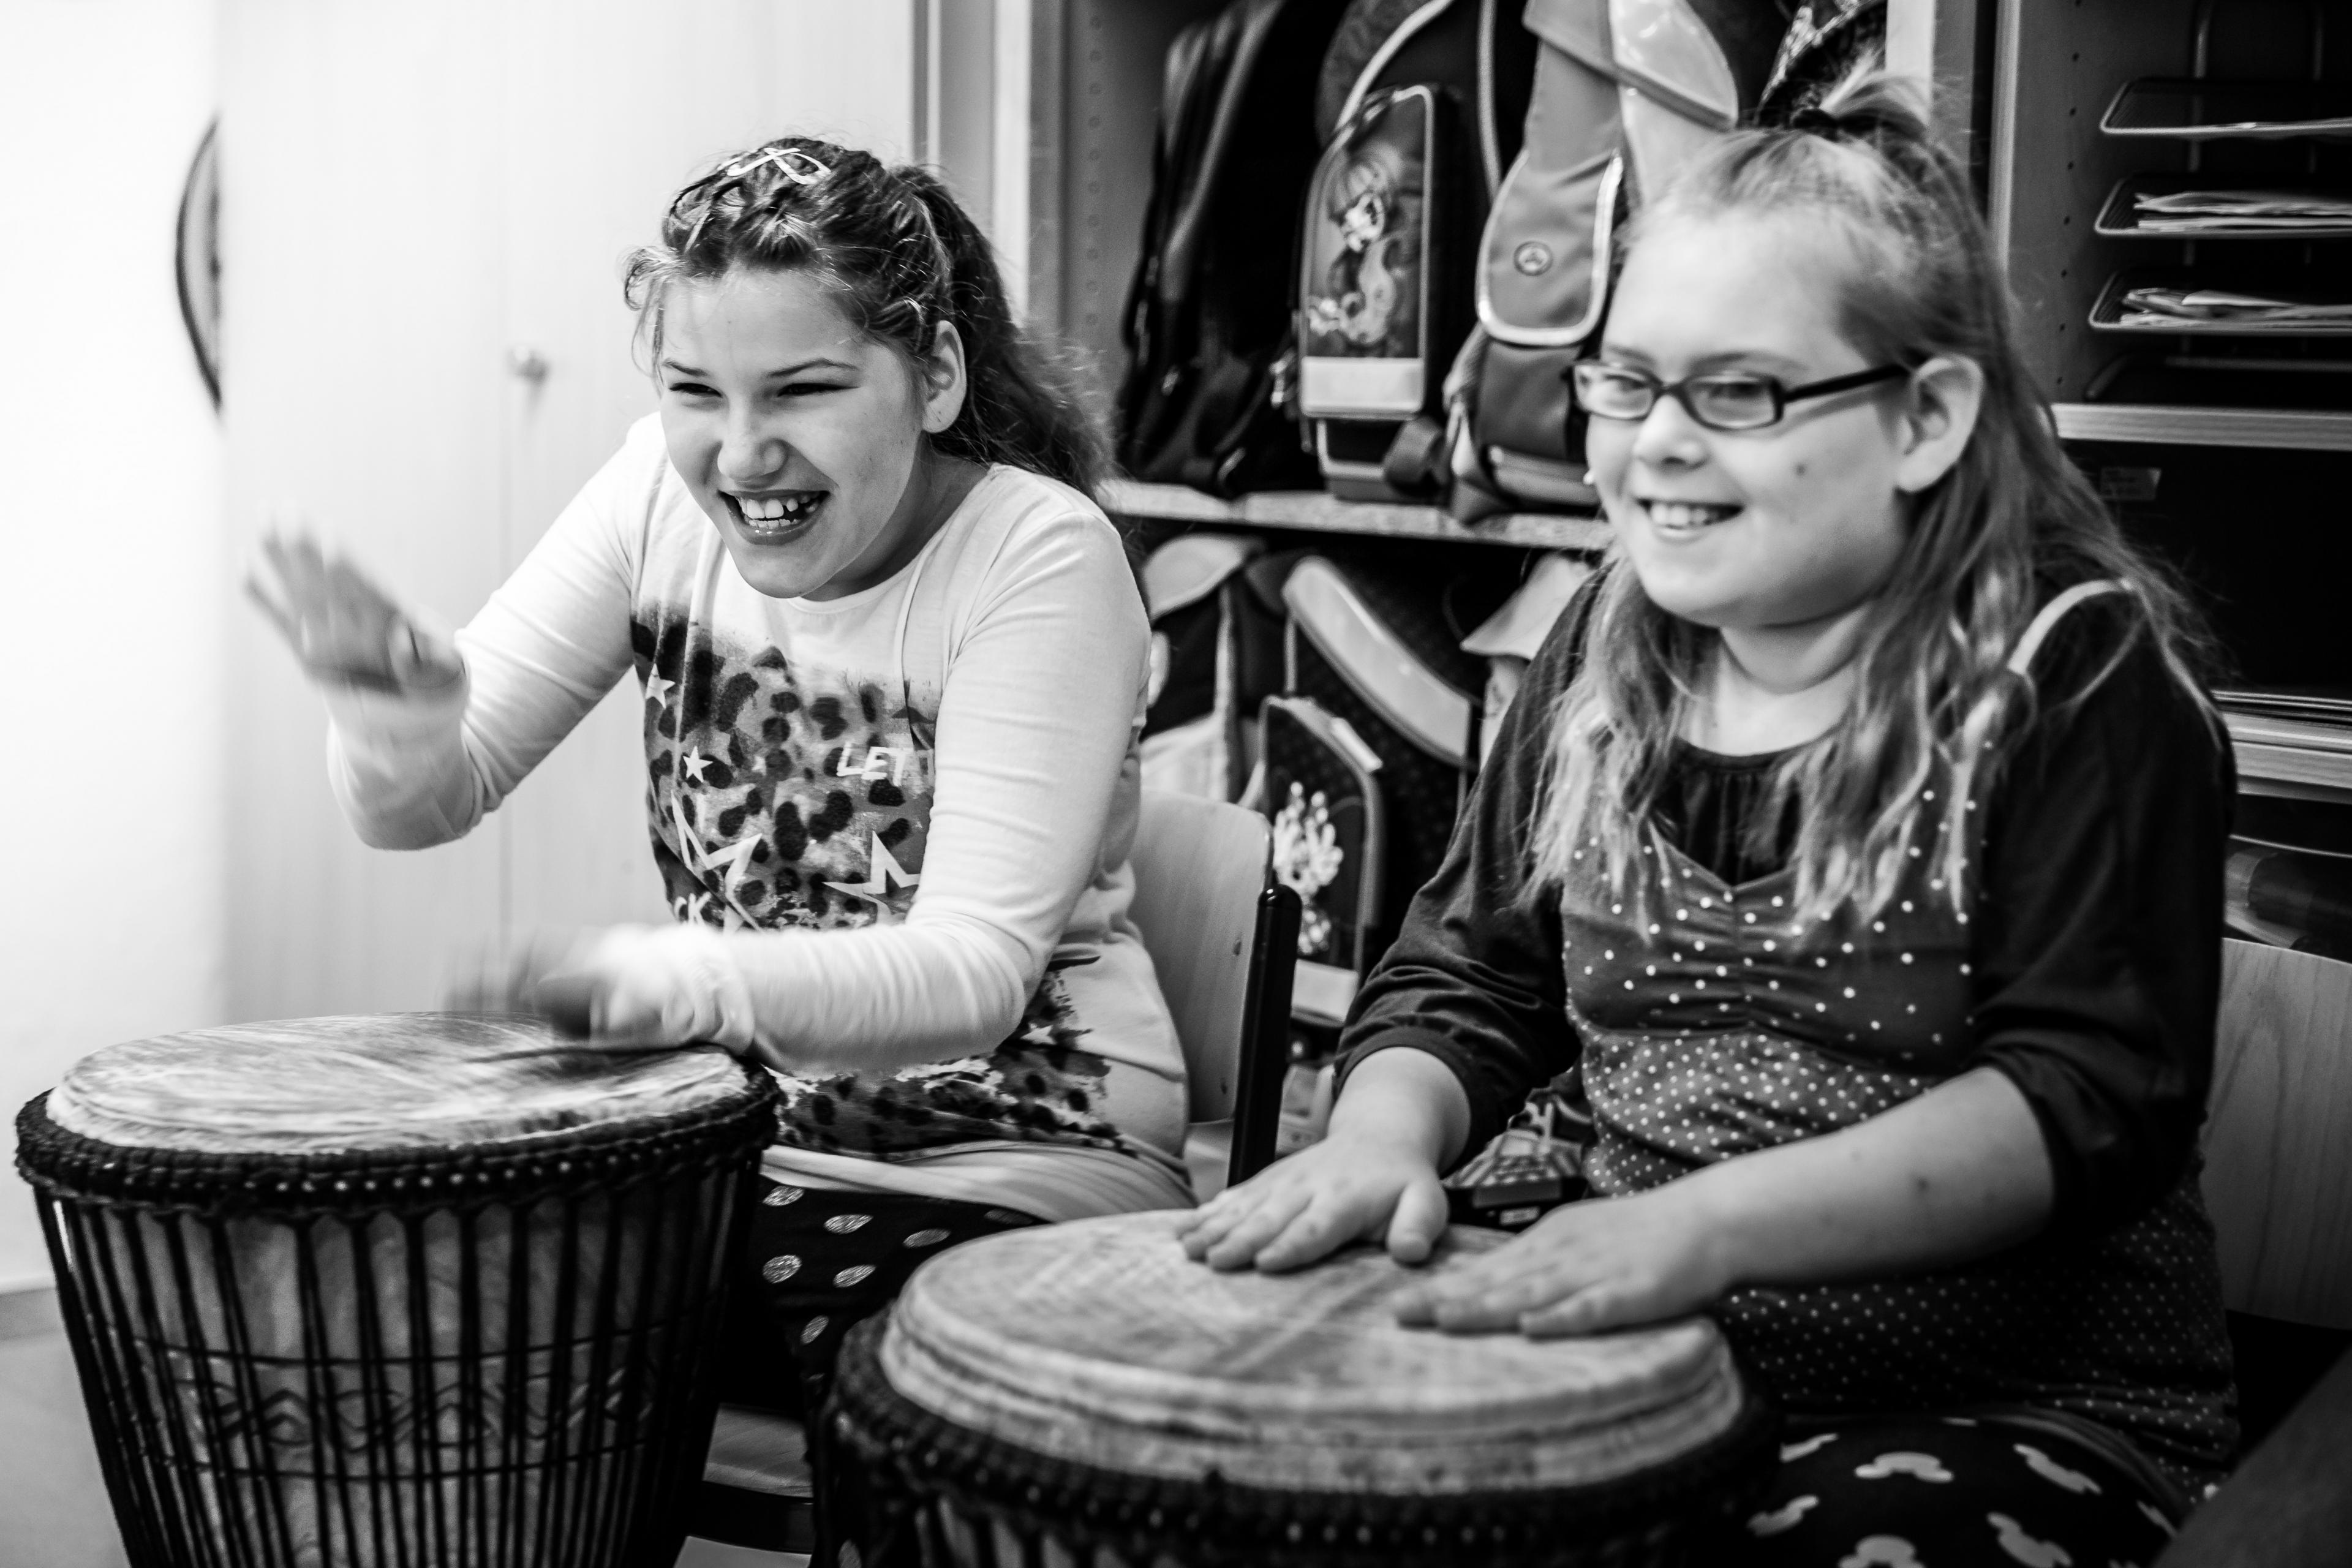 Musikerinnen des Projektes Inklusive:Musik